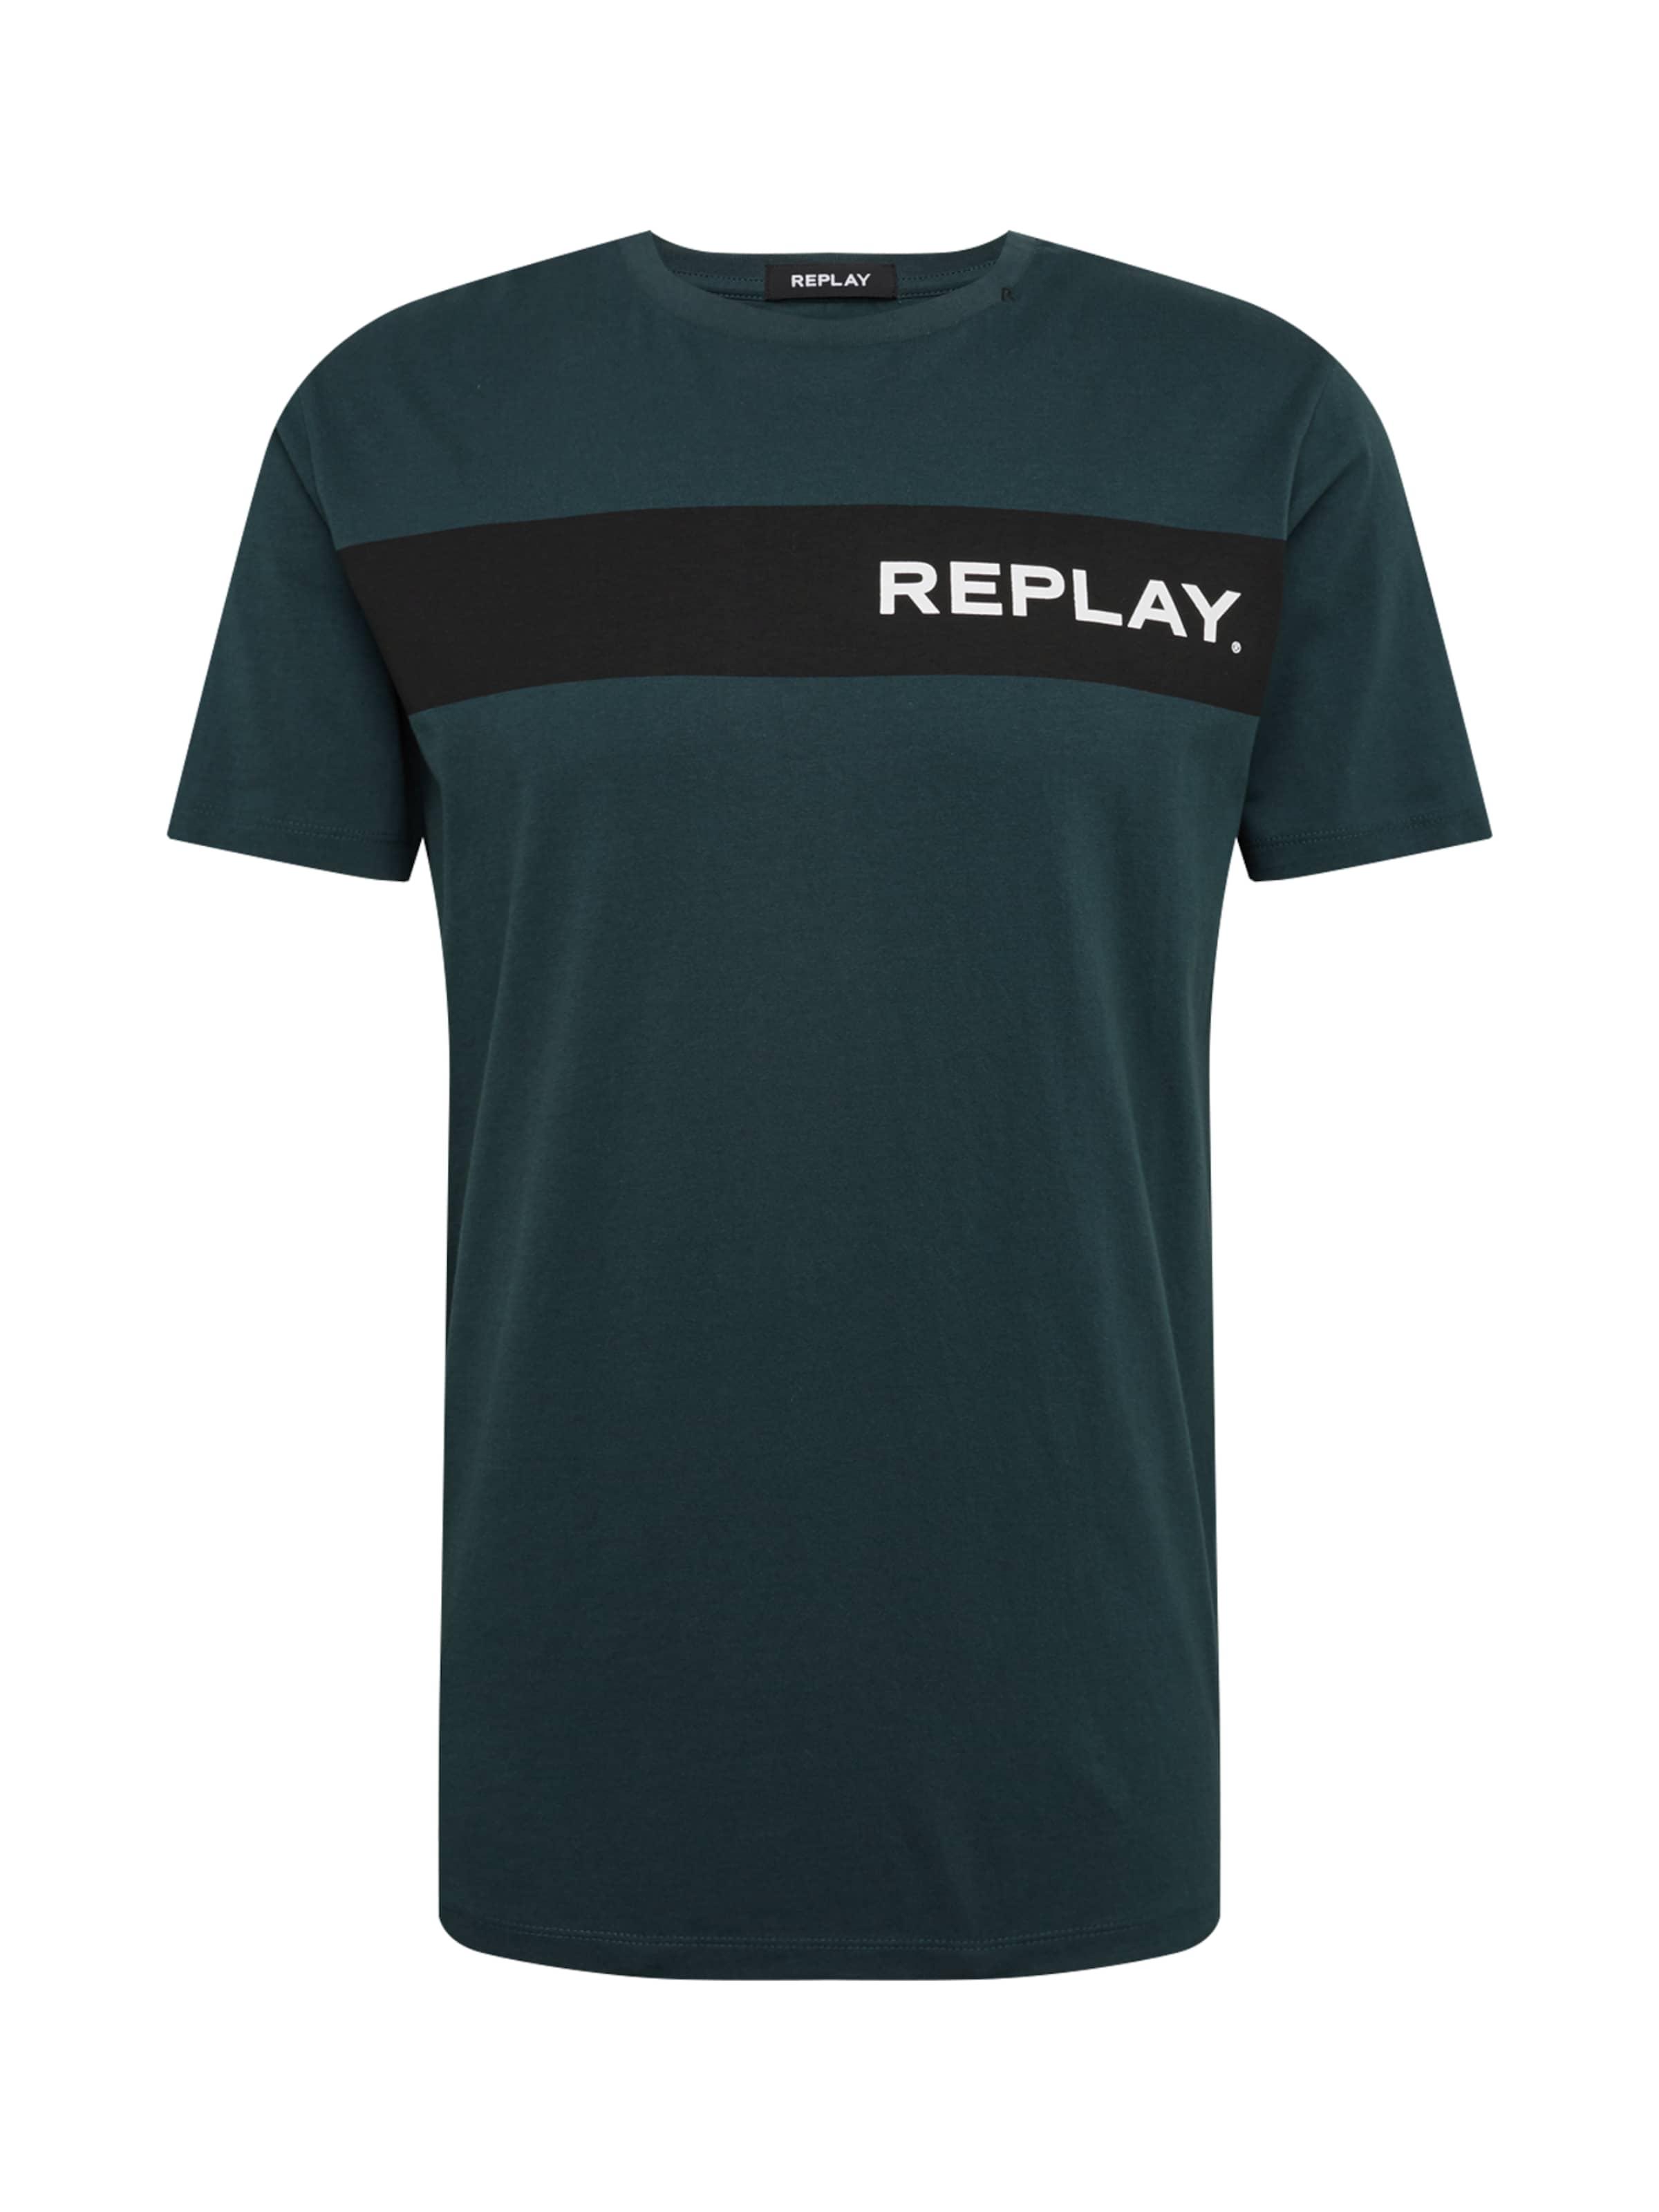 Foncé Replay shirt Vert T En eH9YWDE2I